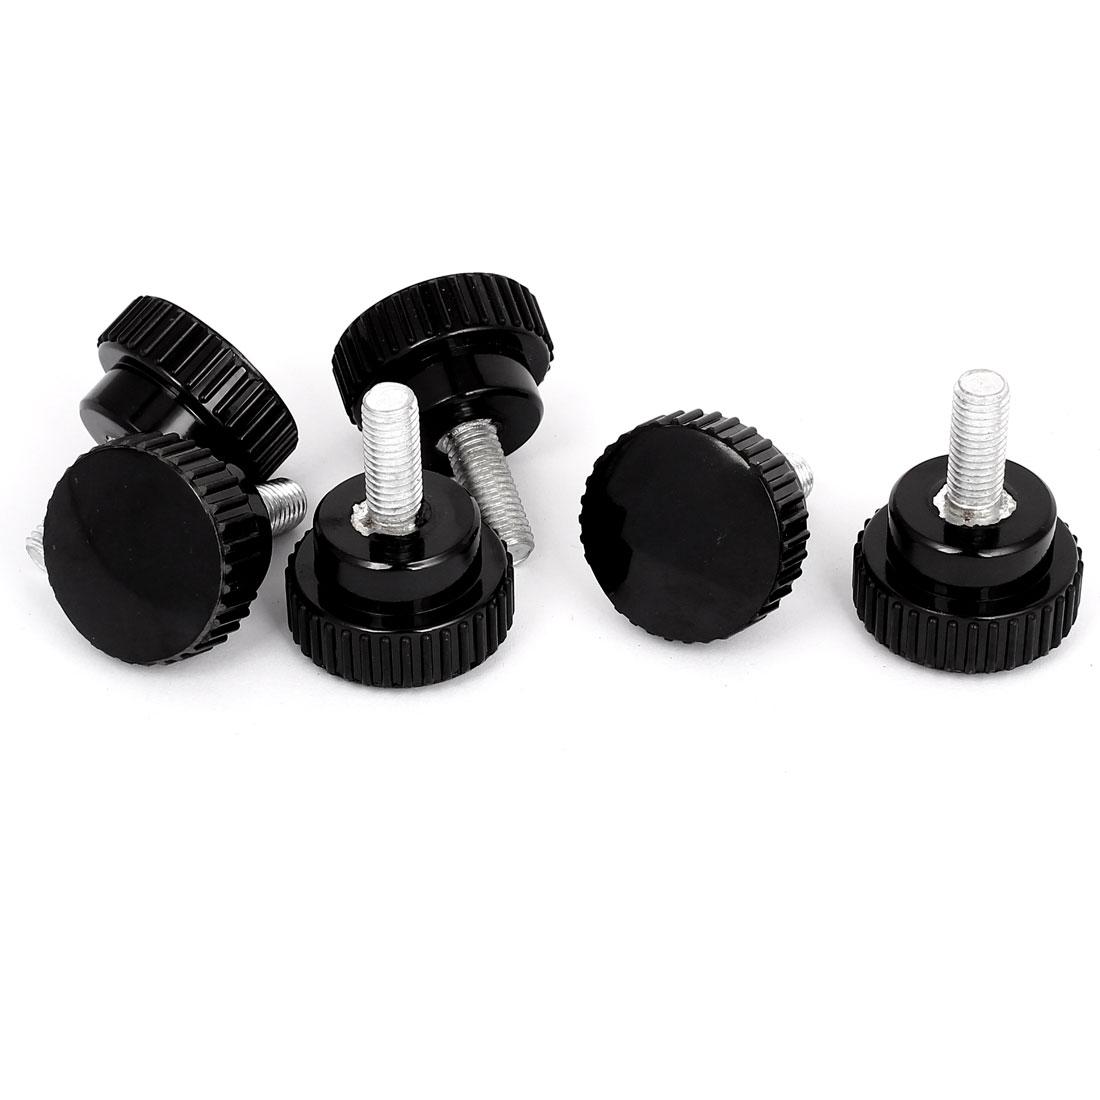 40mm Plastic Round Head 10mmx25mm Male Thread Screw on Clamping Knob Grip 6pcs